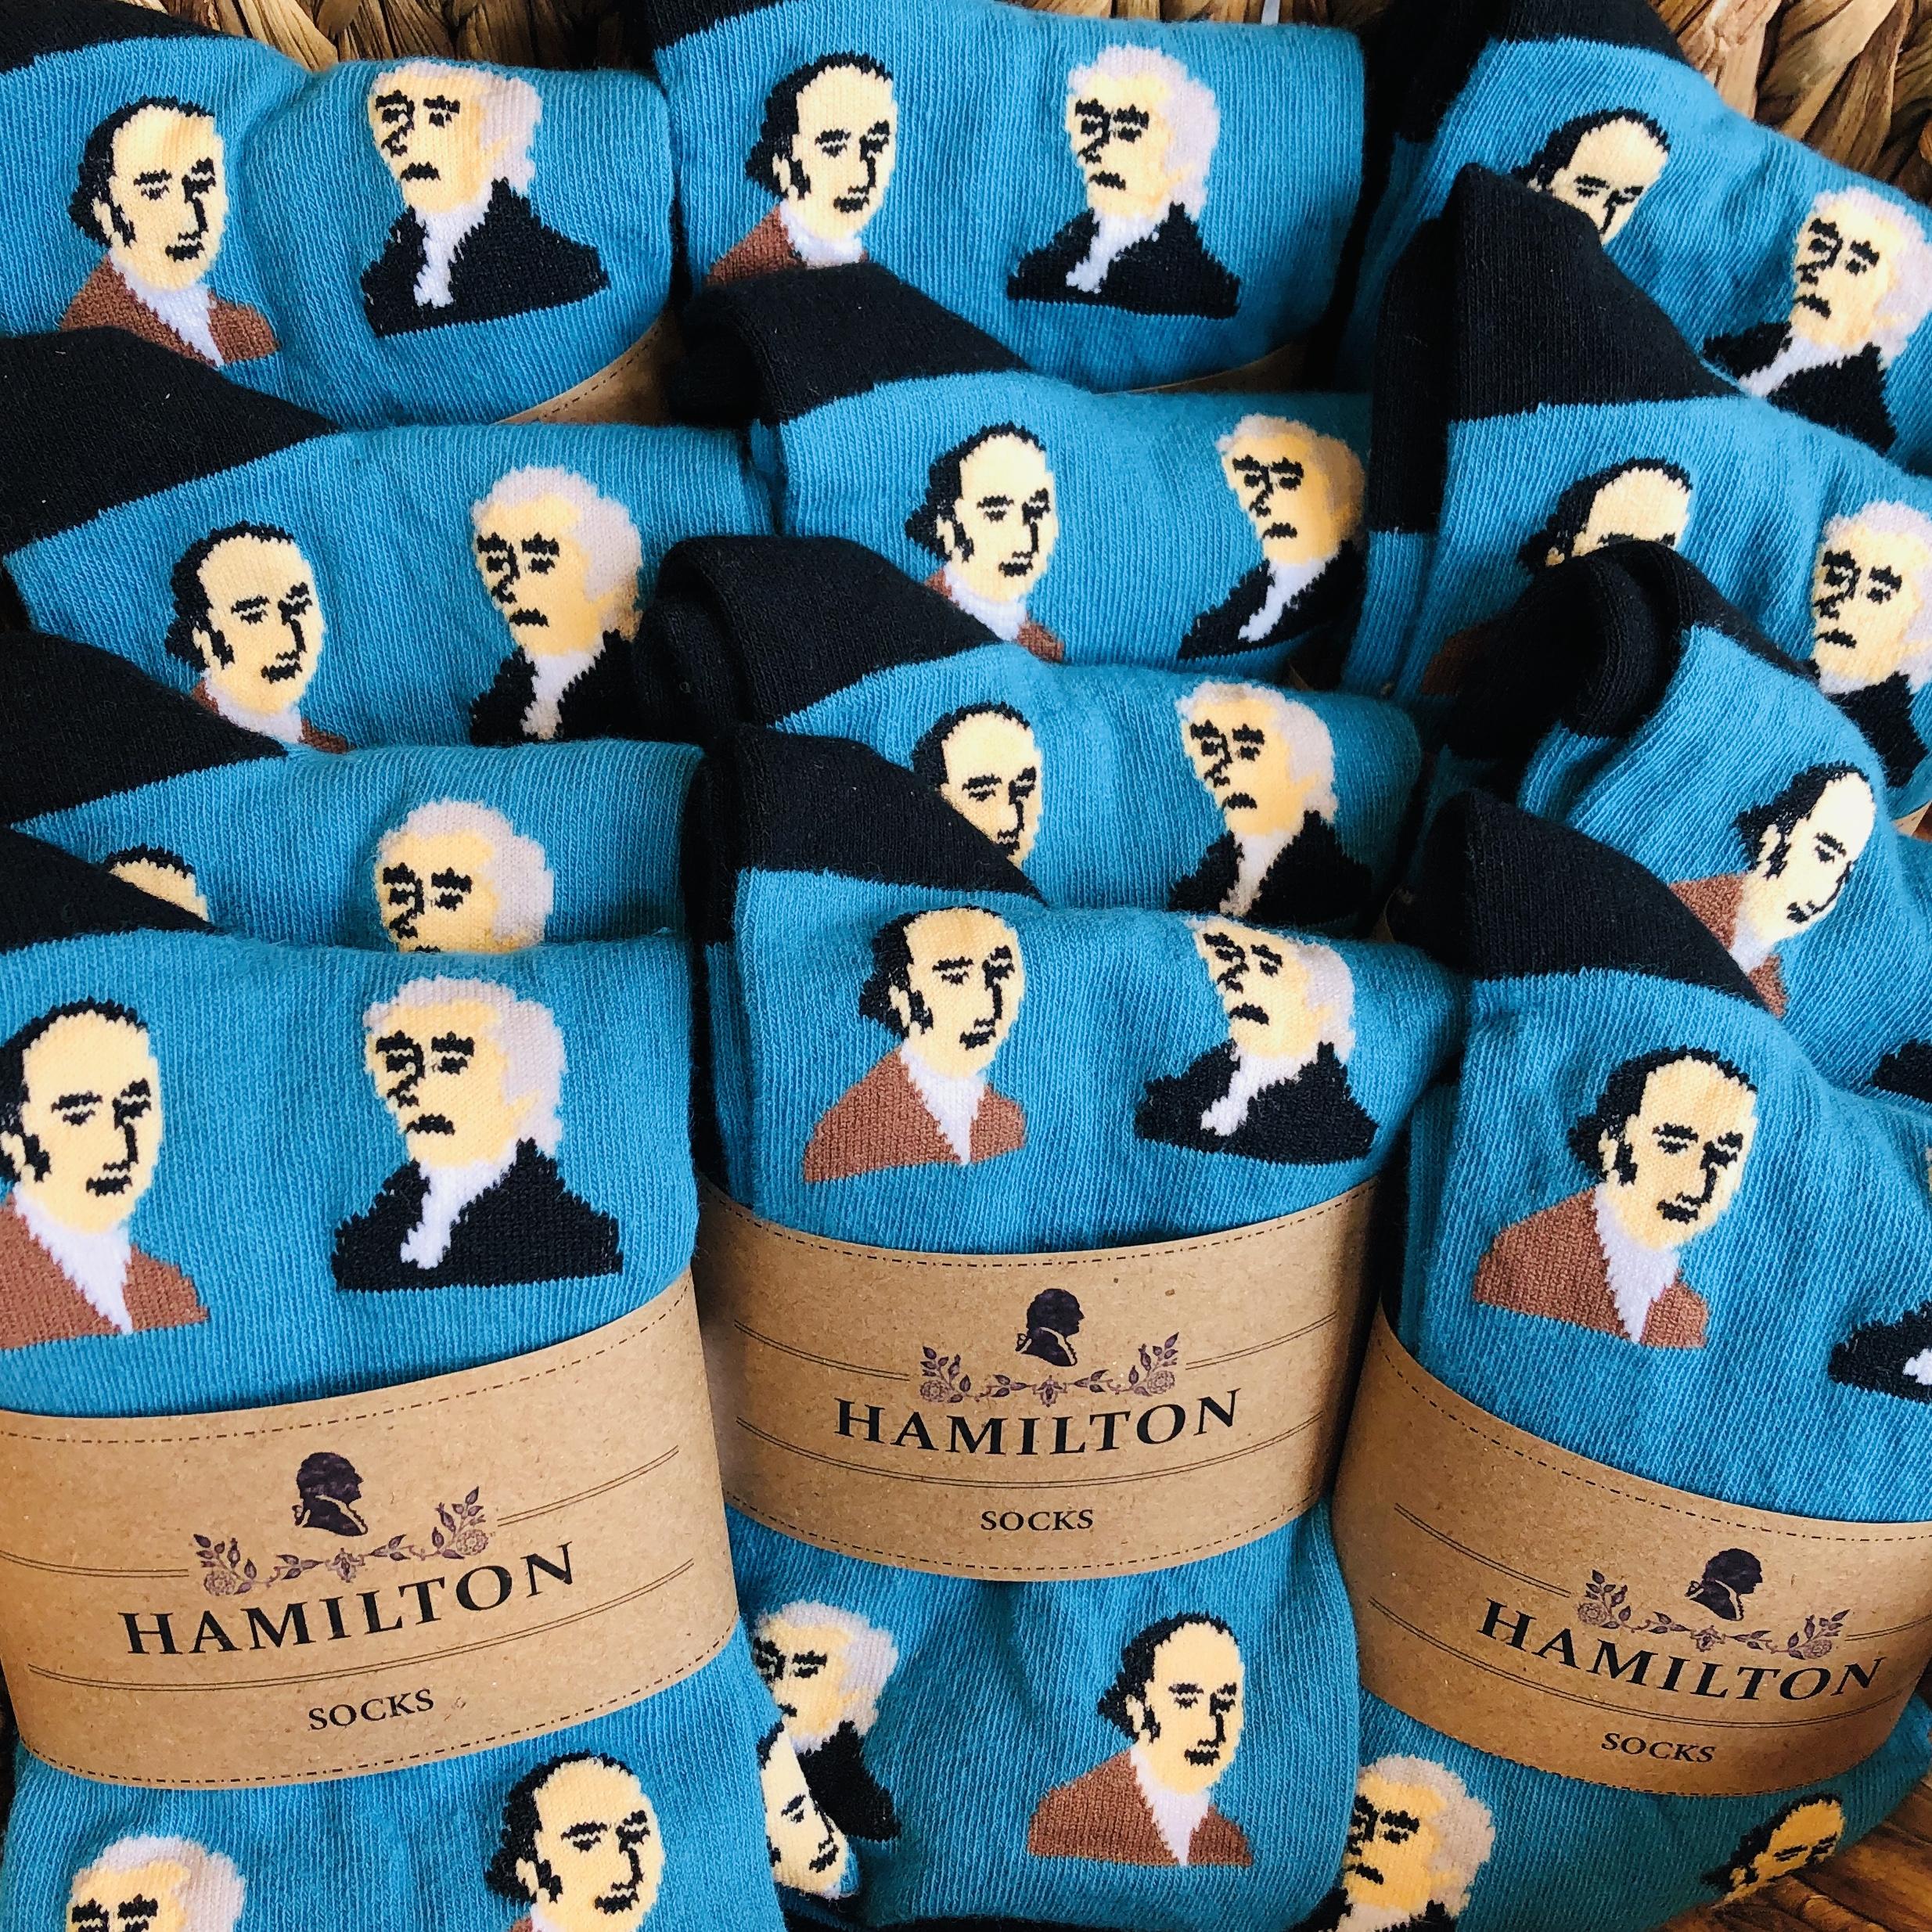 whats-hamilton-socks-02.jpg